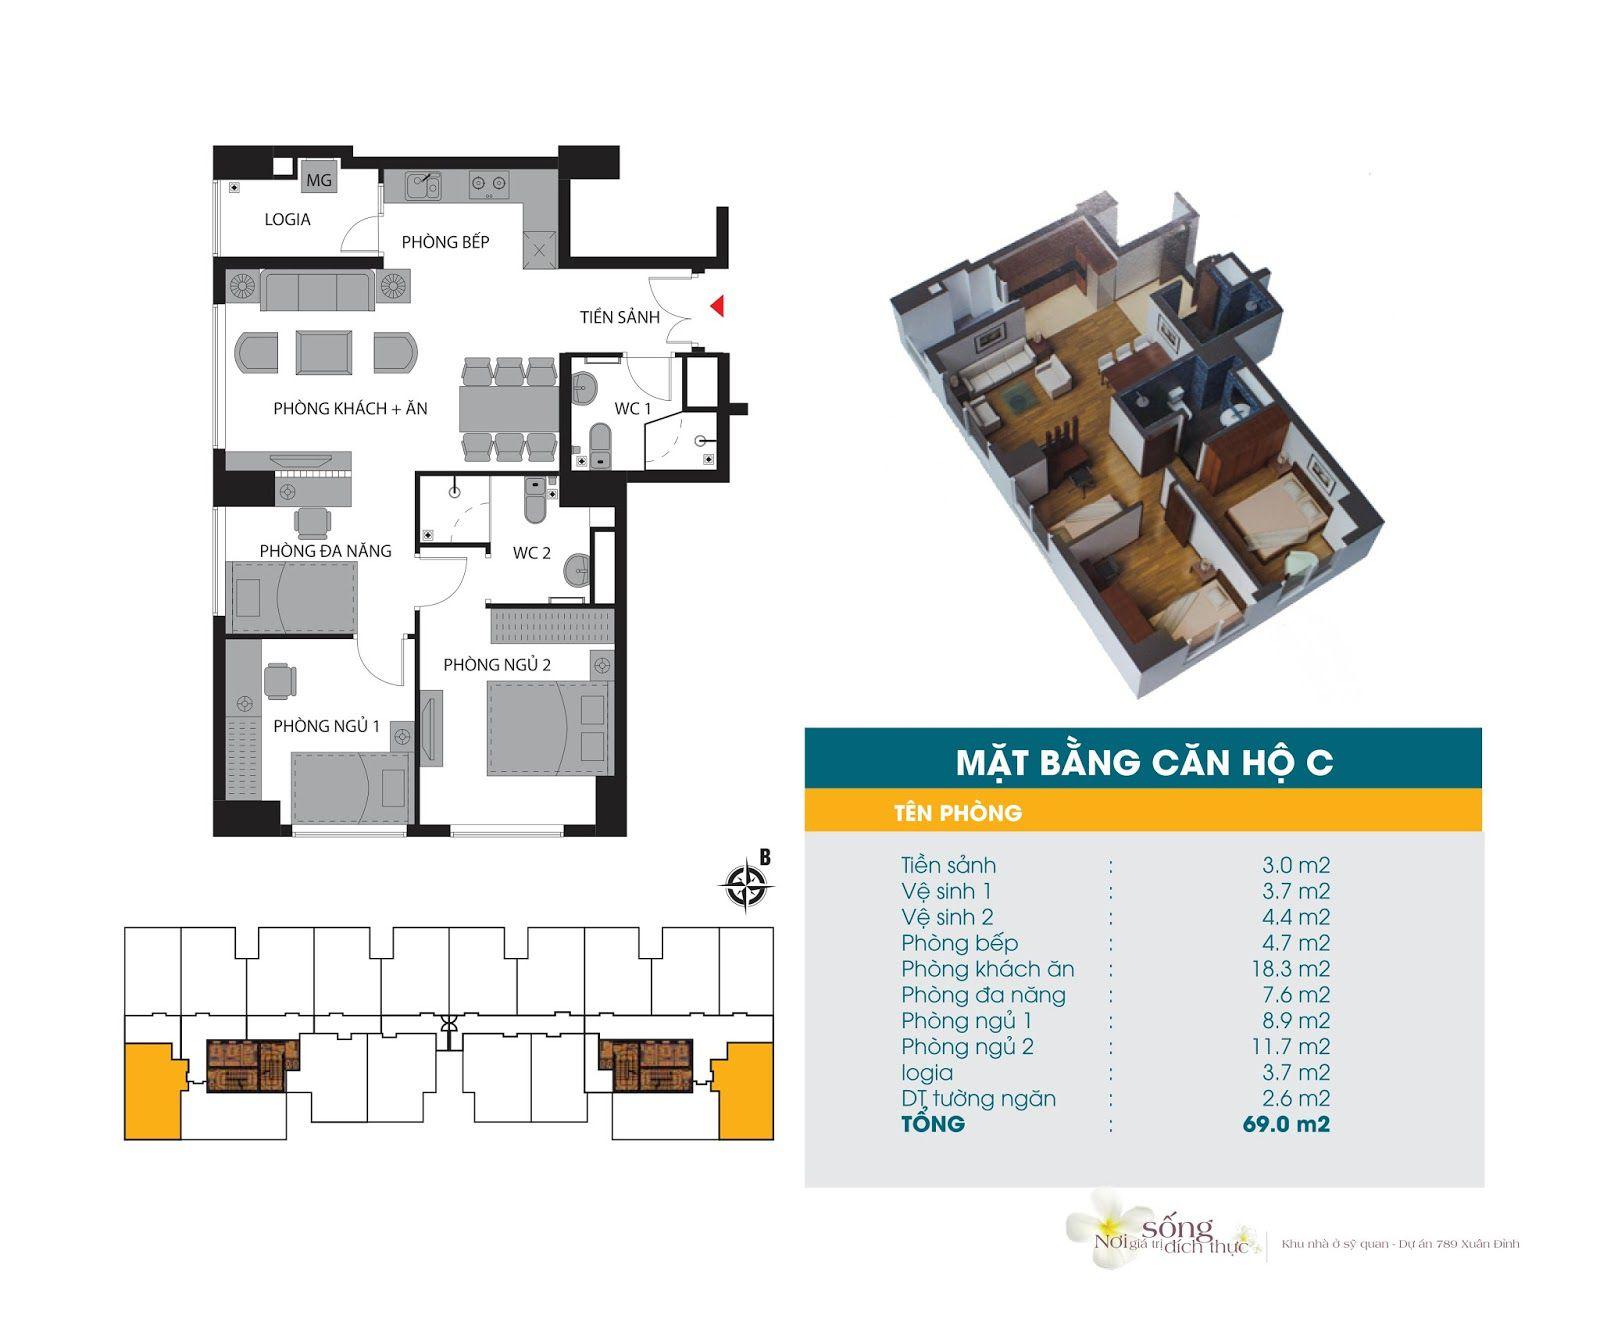 Căn hộ hộ 69 m2